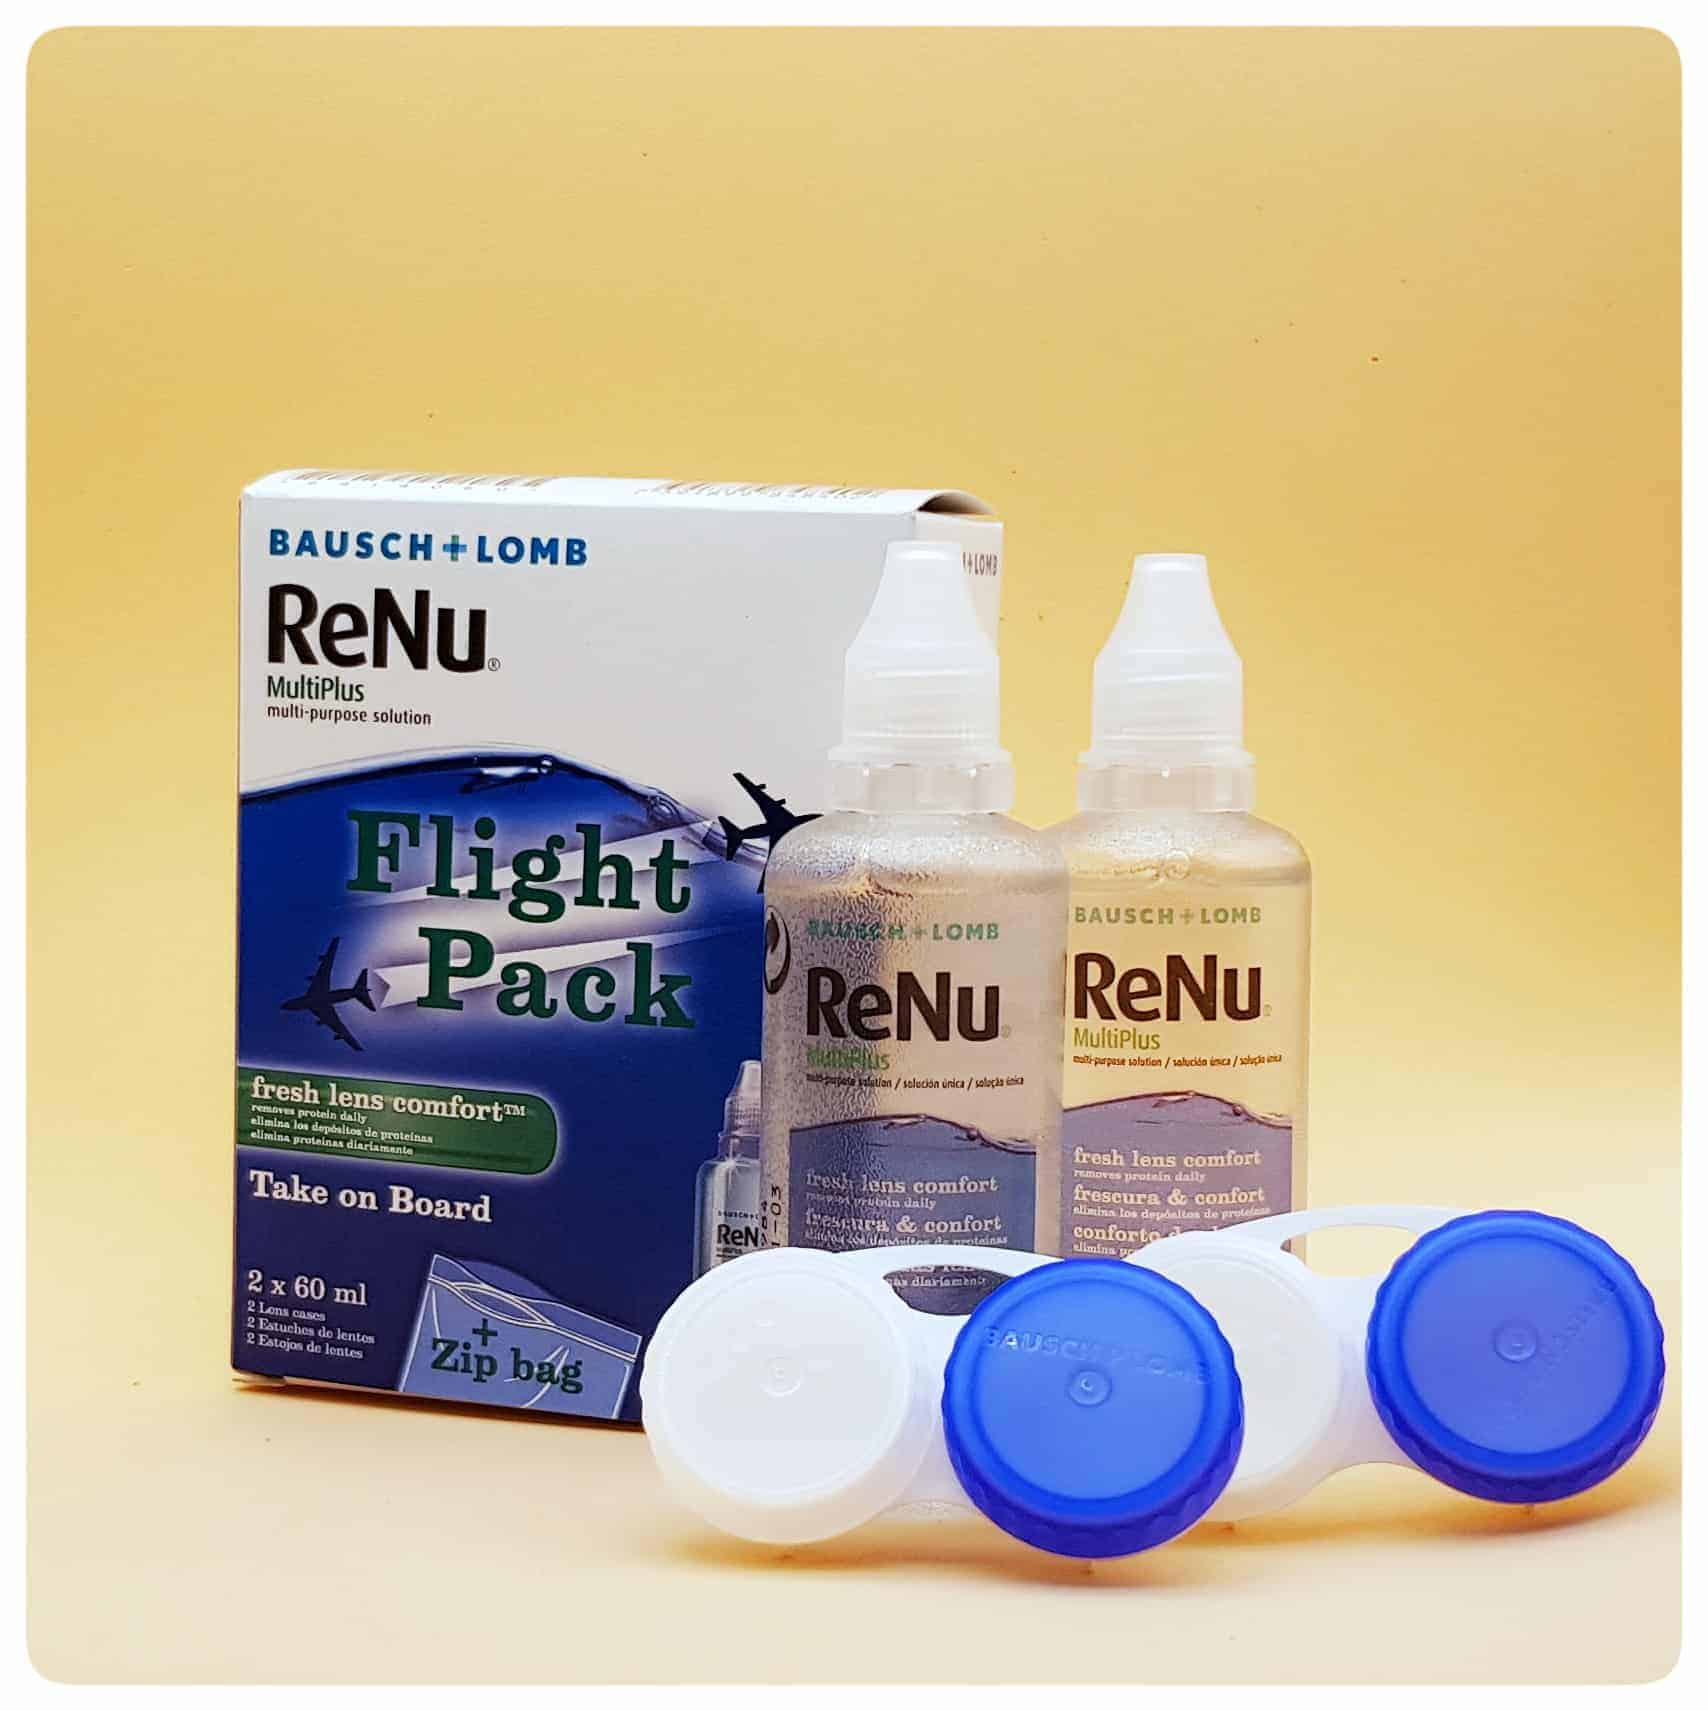 ReNu Multiplus Flight Pack 2x60ml